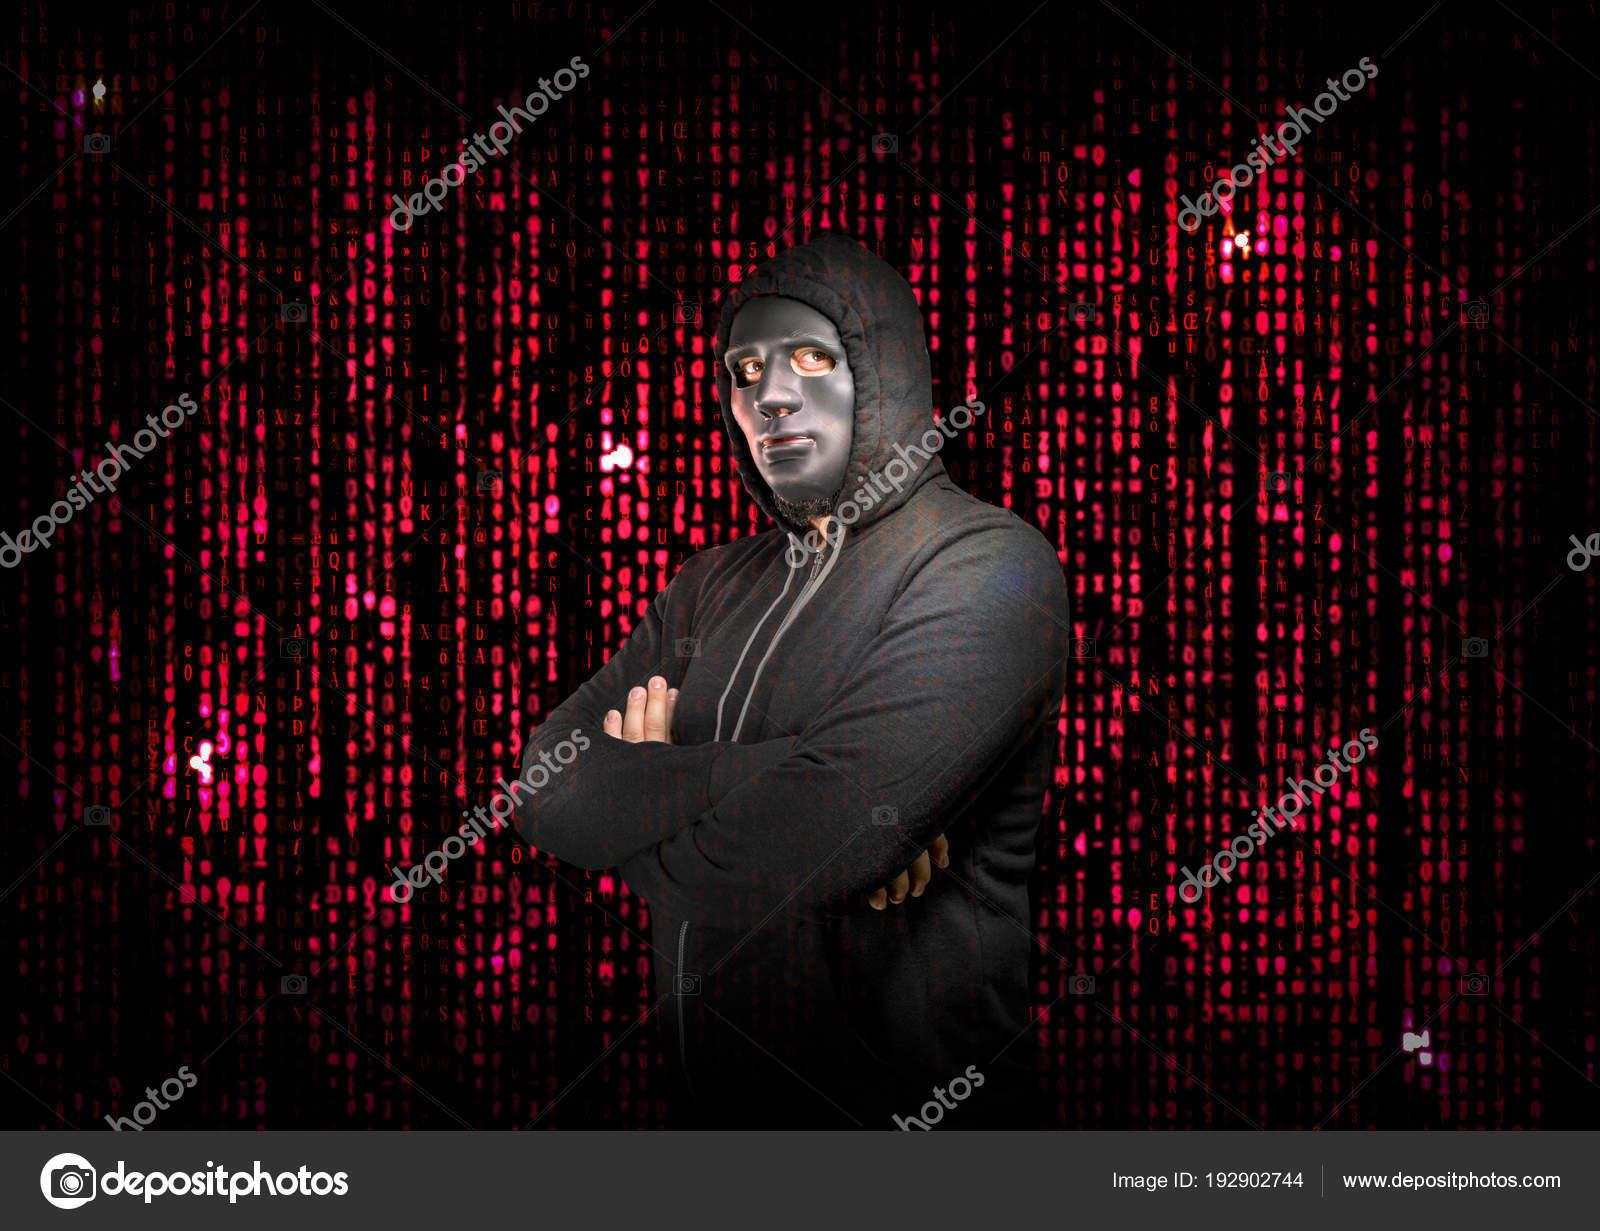 Una Dietro Stile Matrix Hacker Braccia Maschera Con Incrociate lFTKJ31c